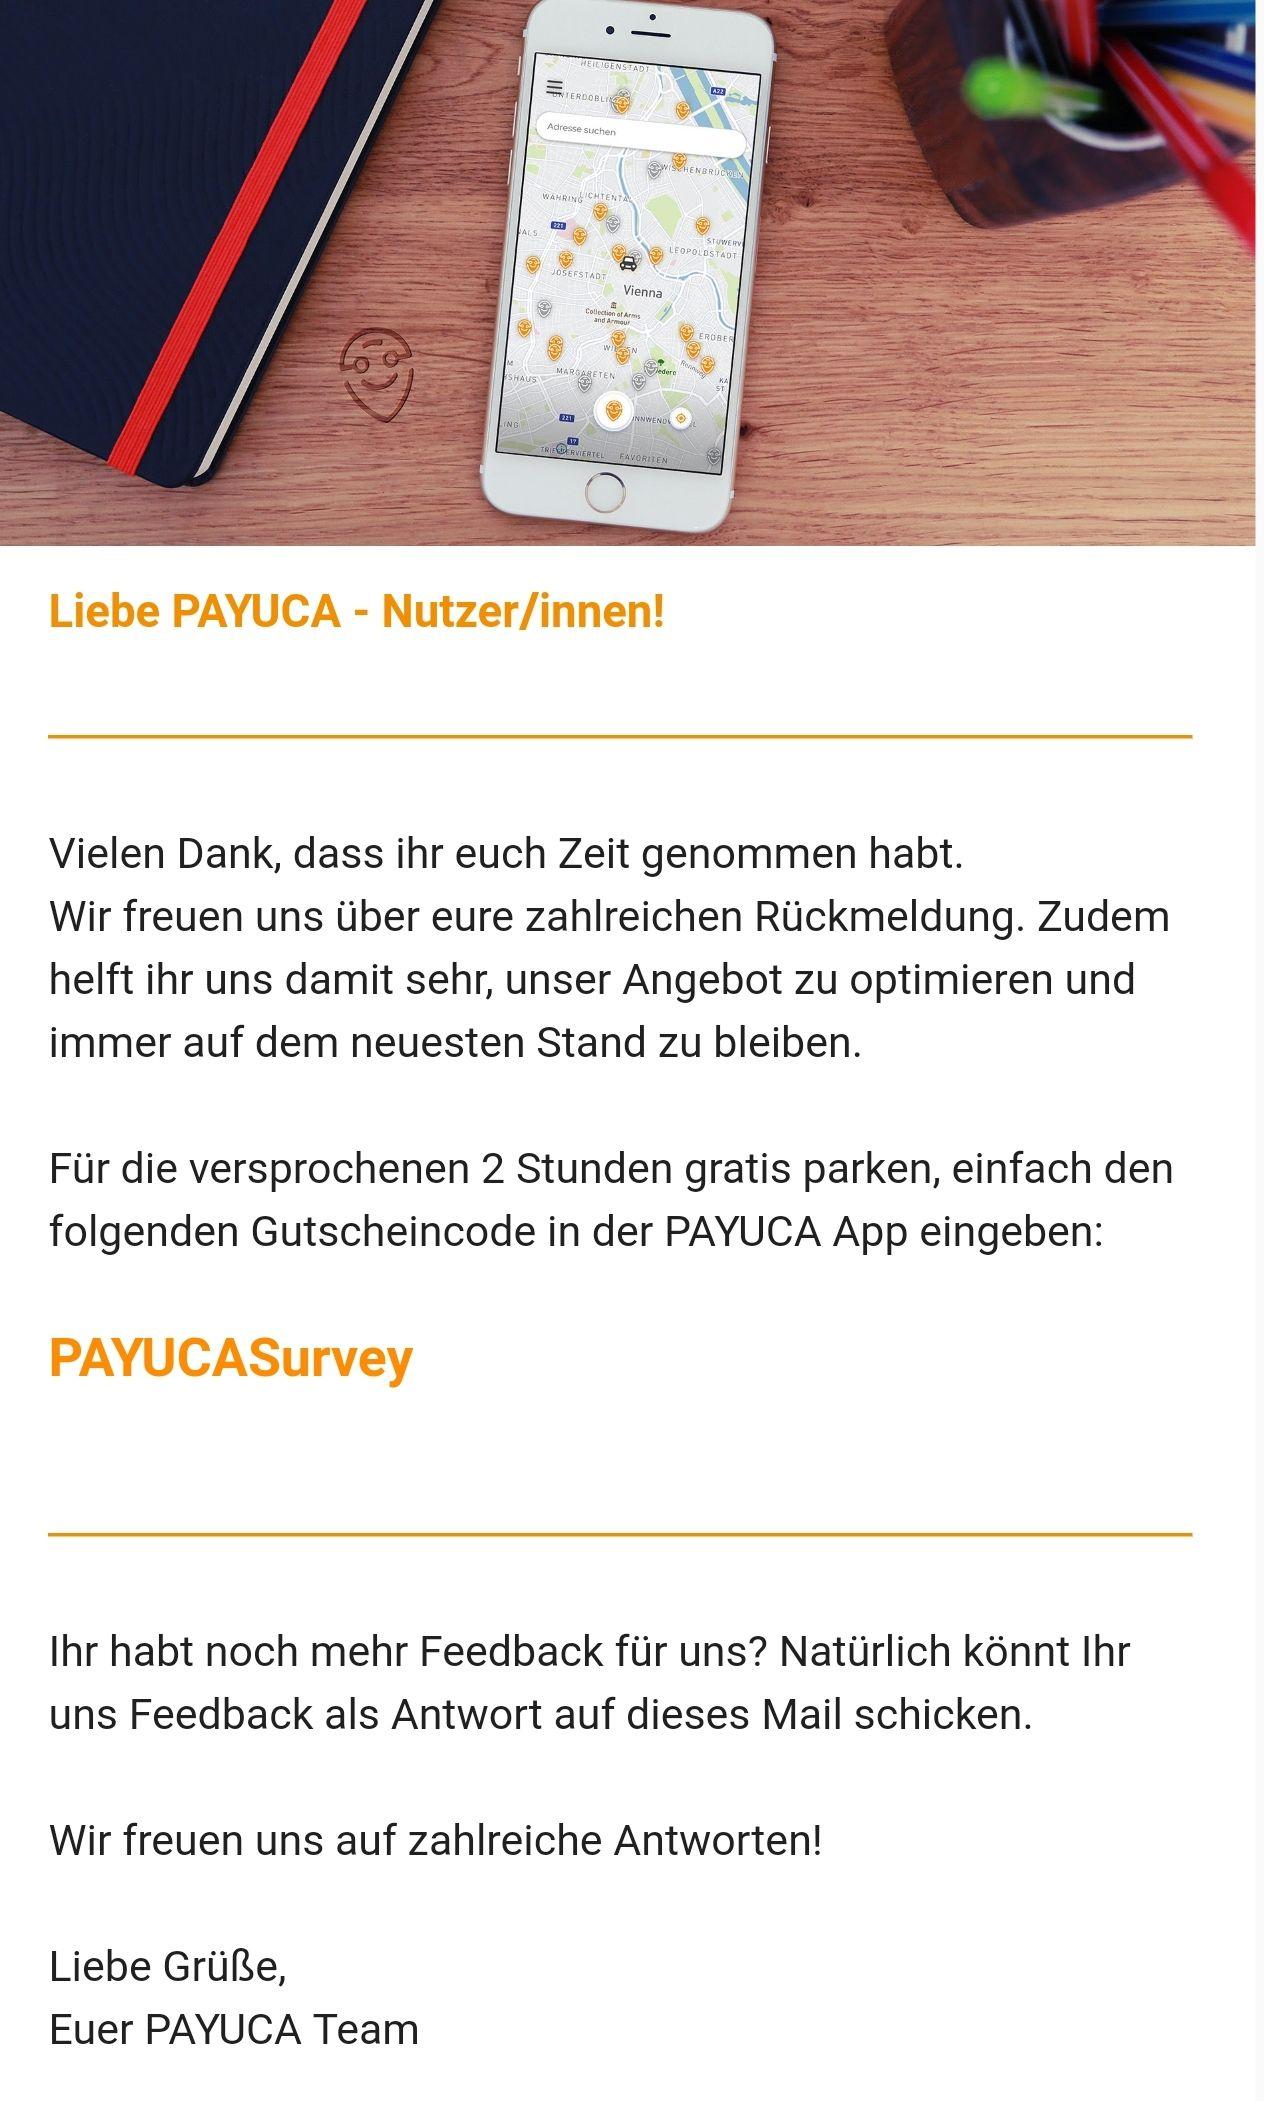 Payuca - 2h gratis parken in Wien